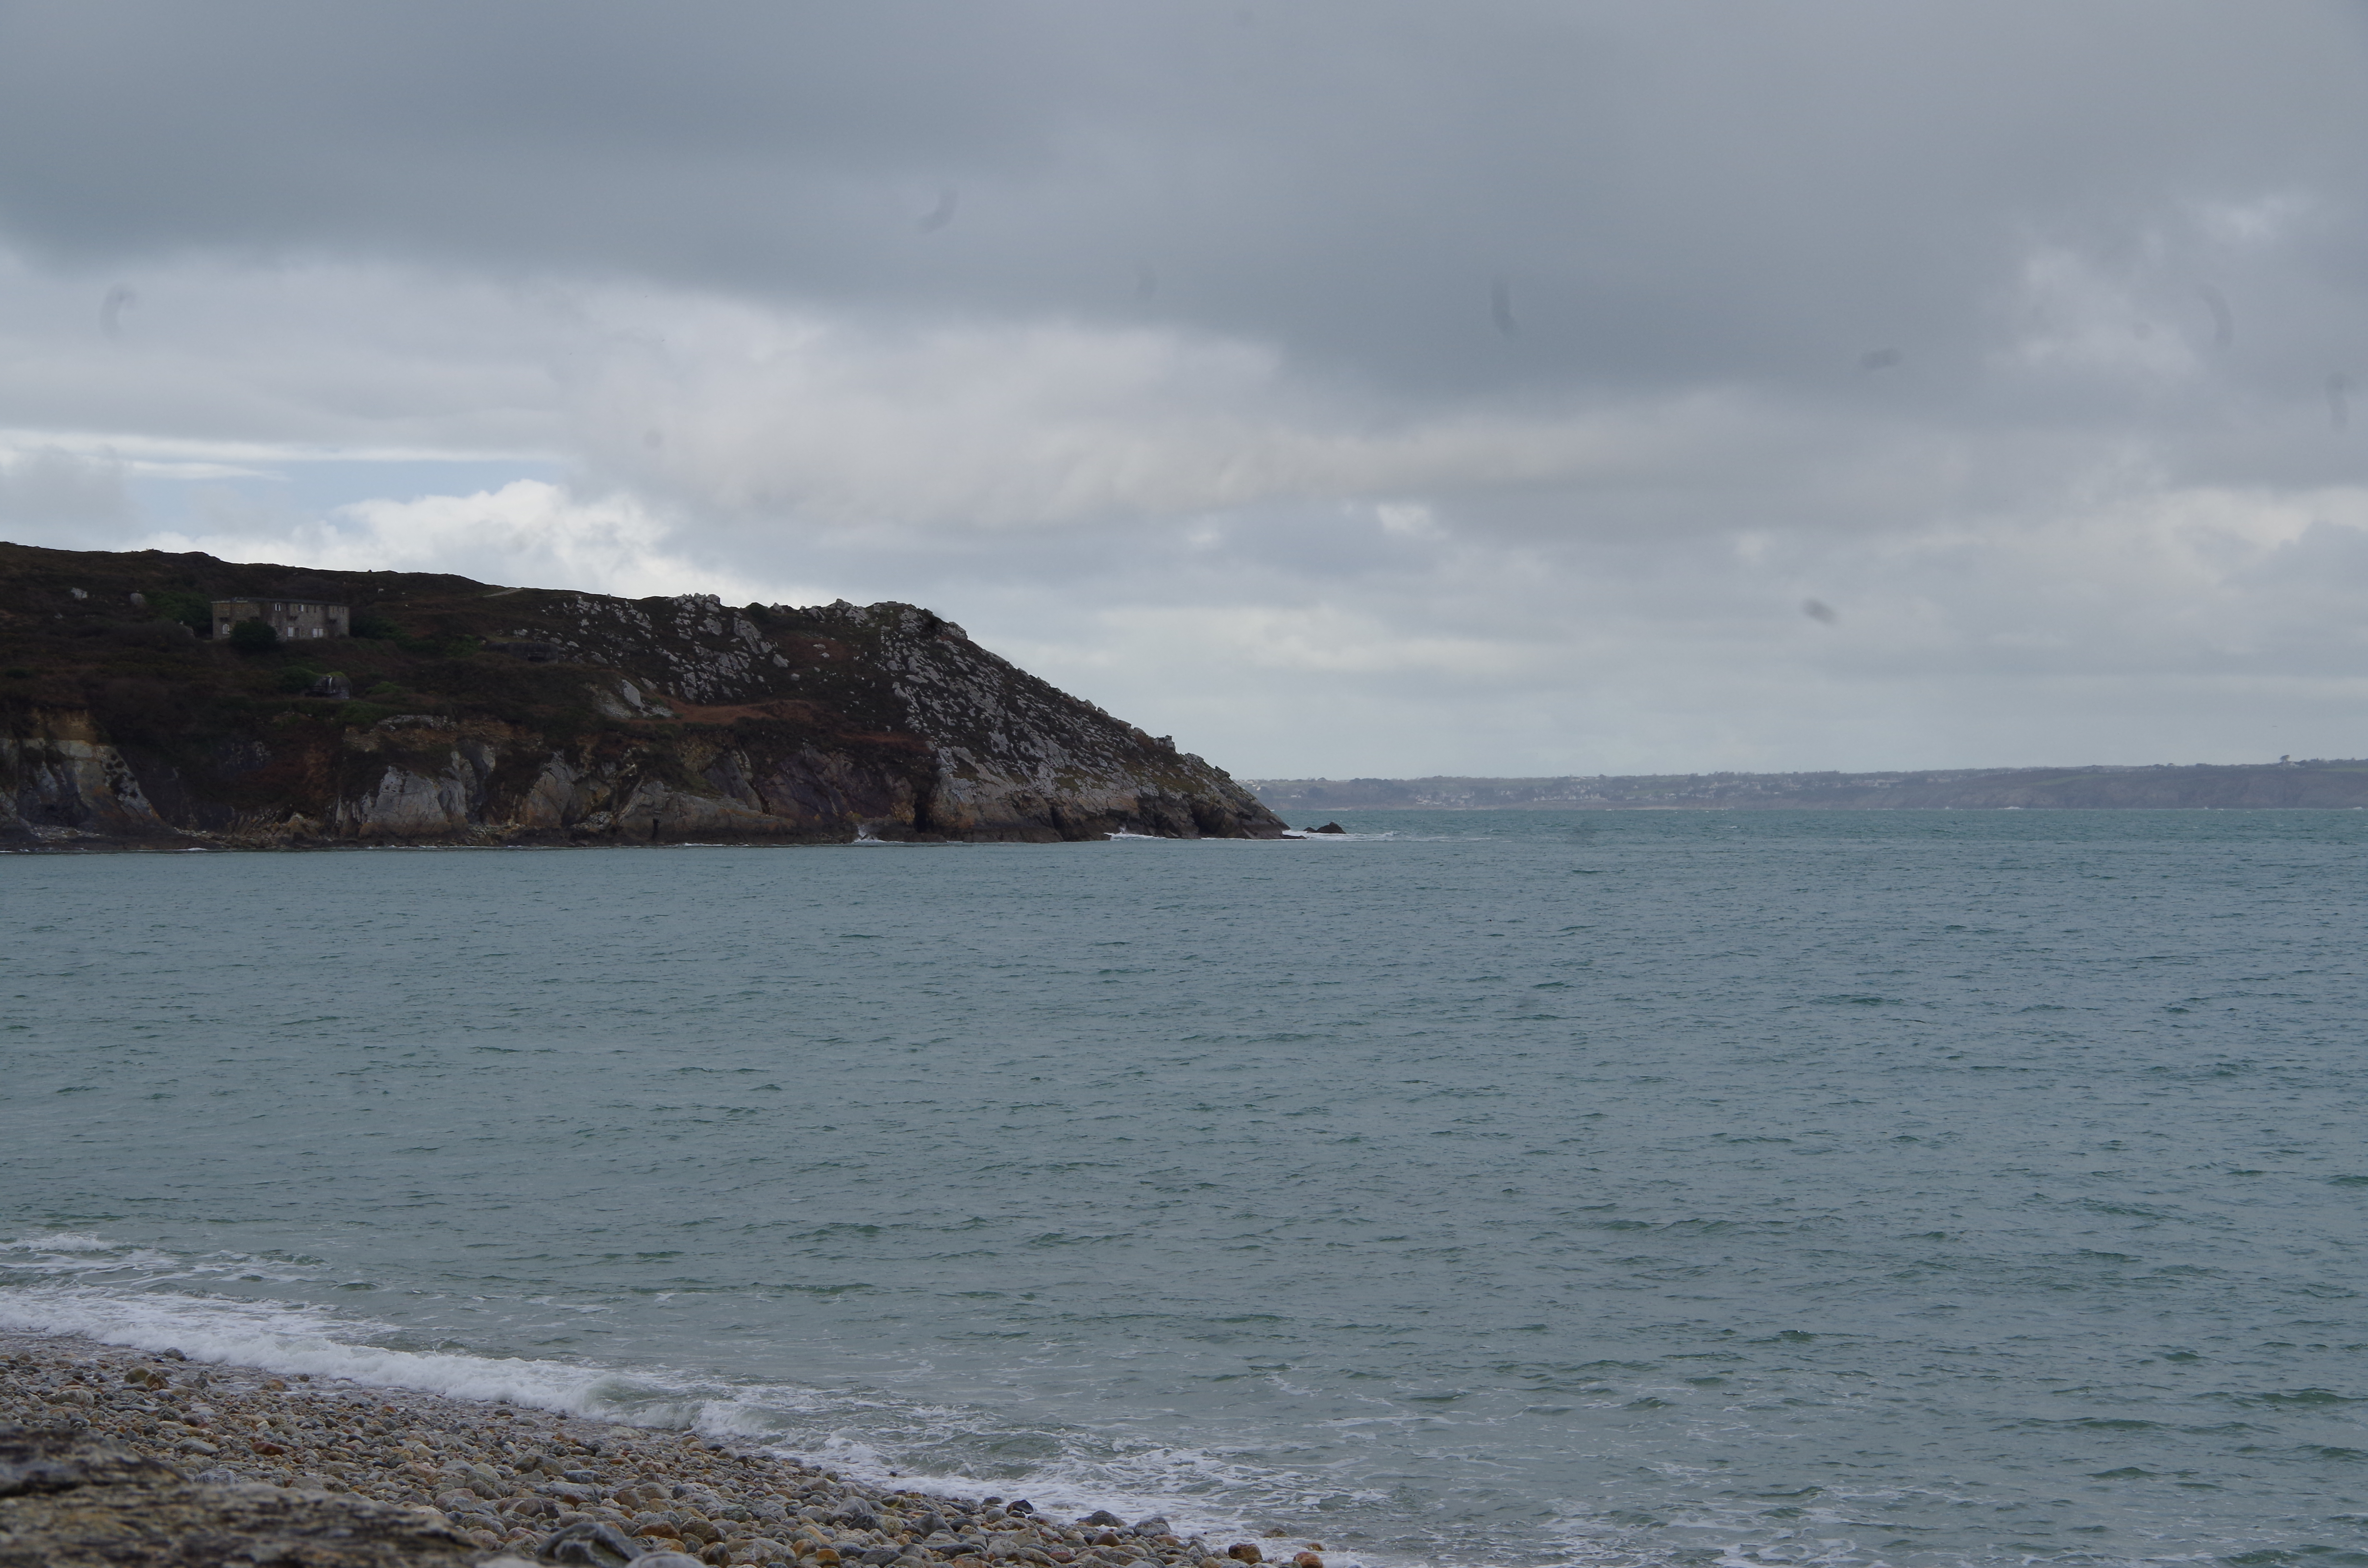 La plage du Correjou Camaret/mer